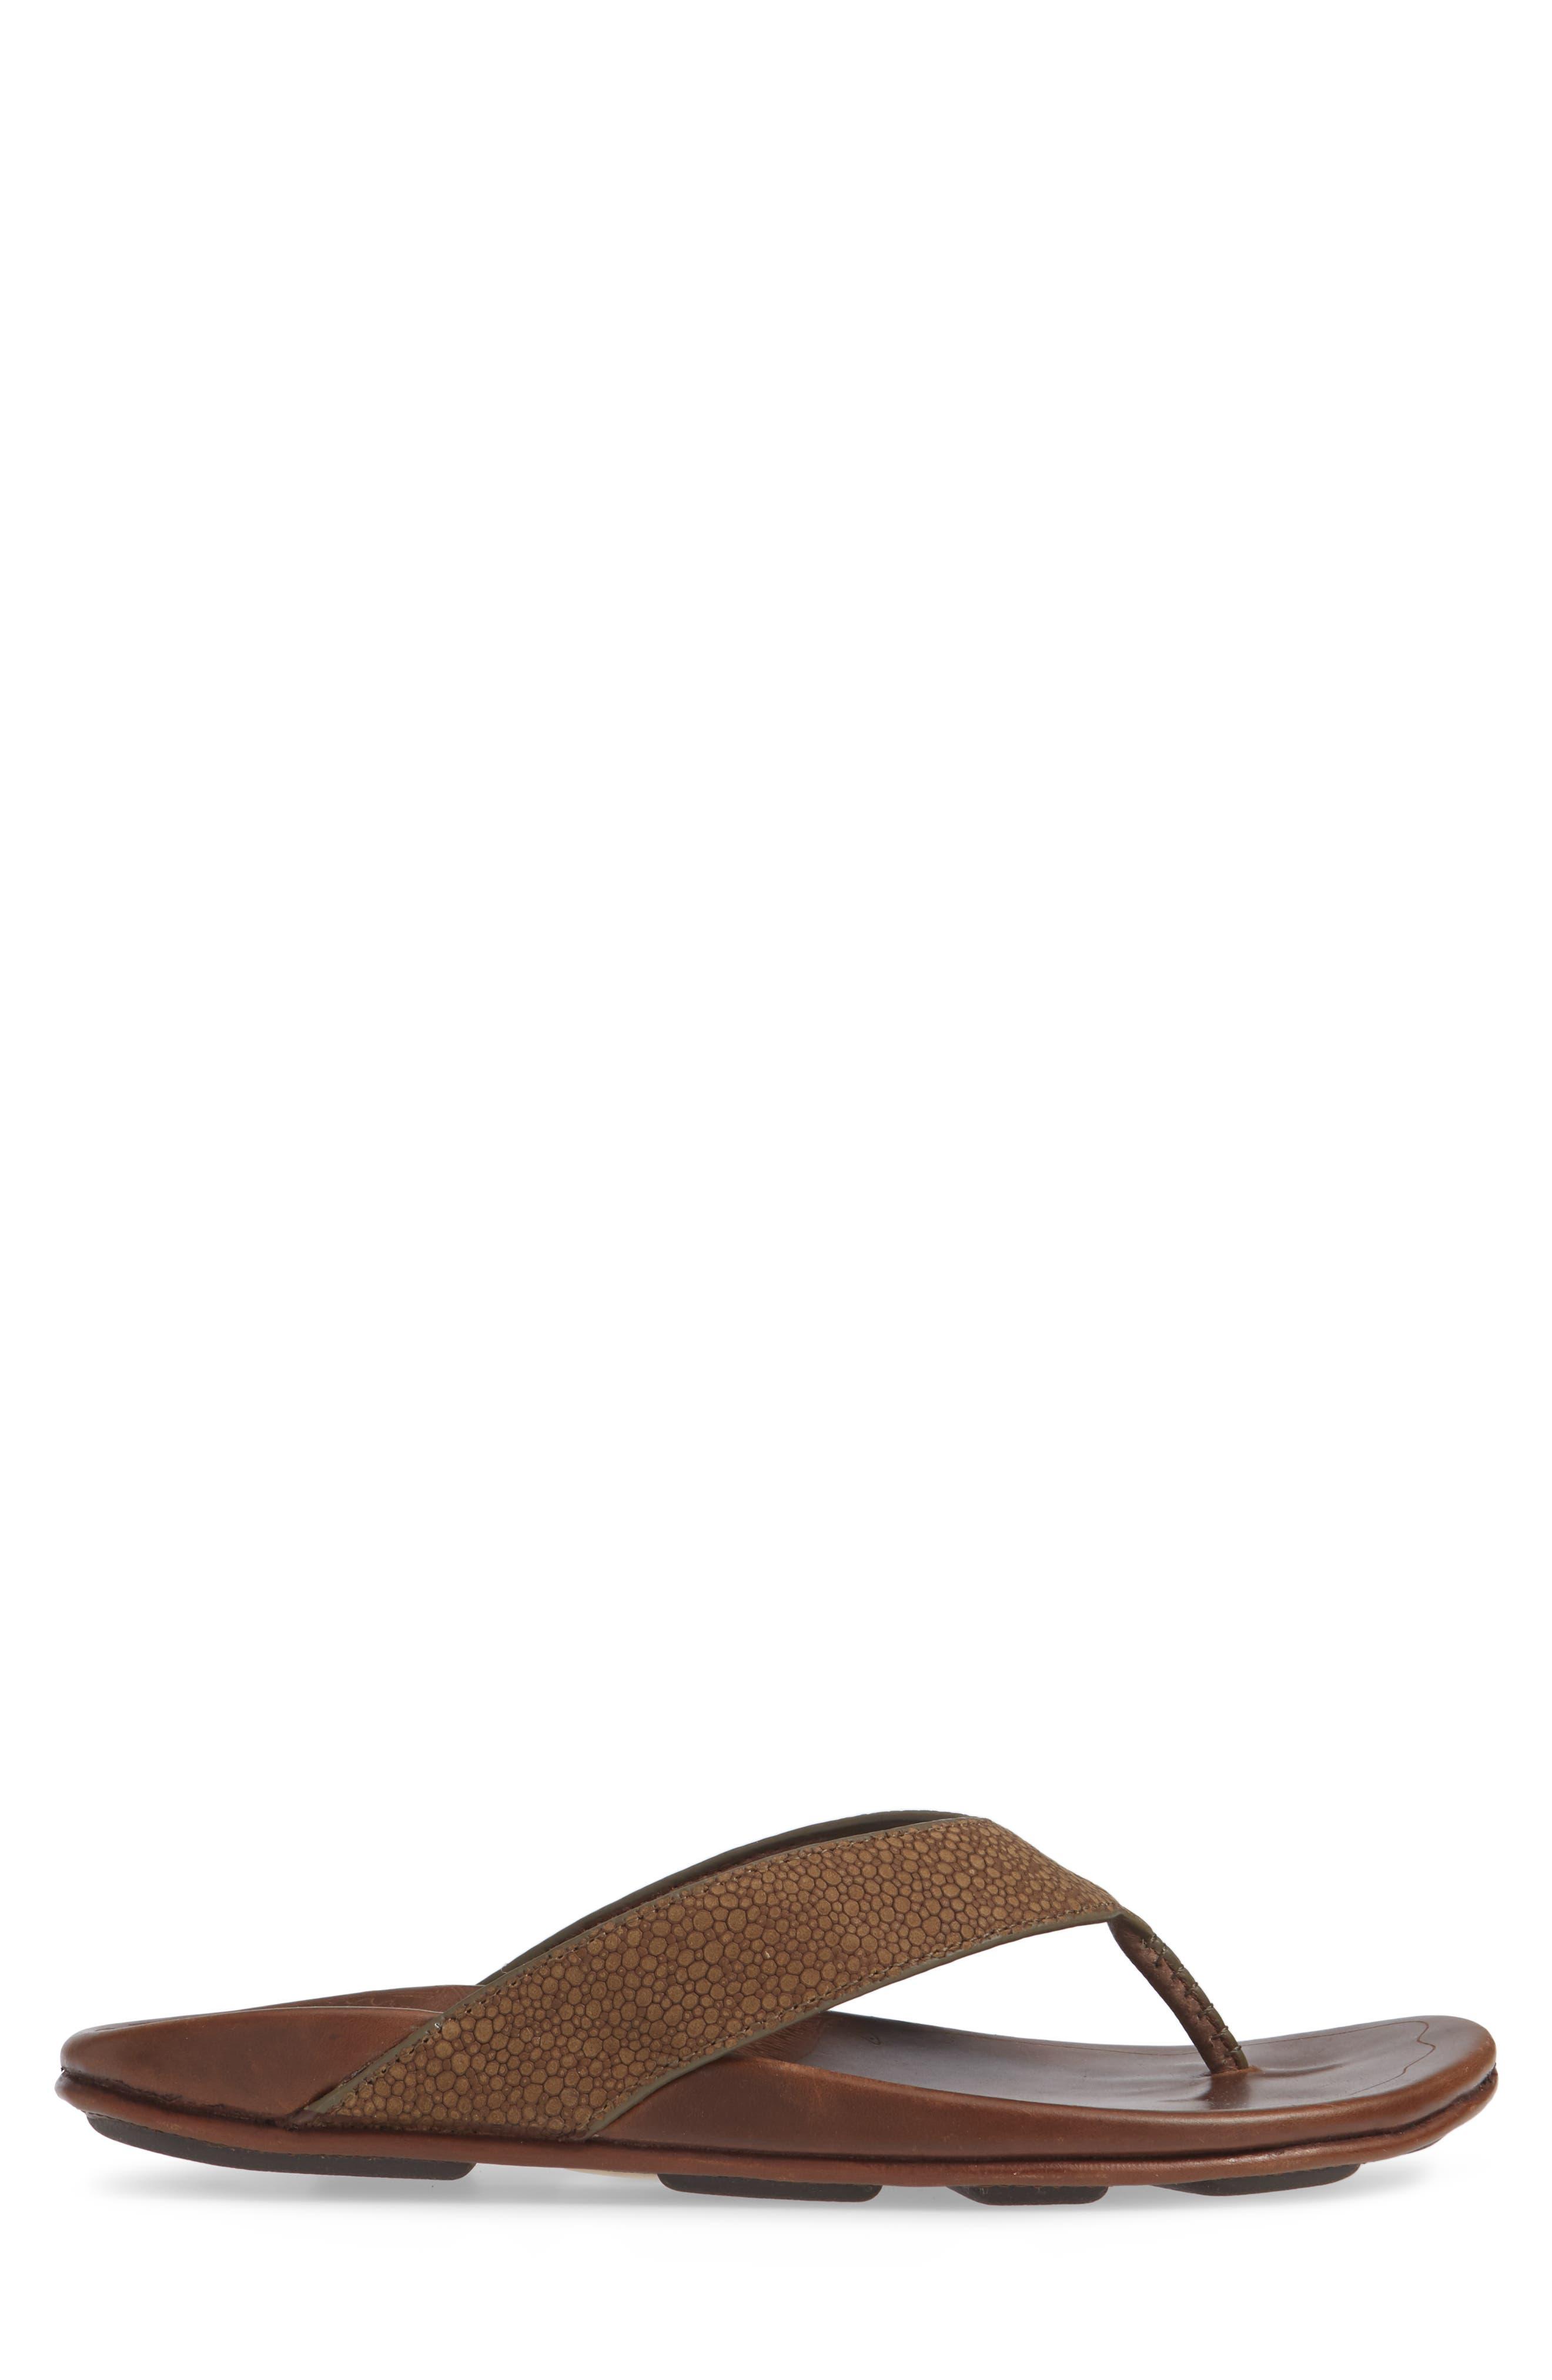 Kohana Kai Flip Flop,                             Alternate thumbnail 3, color,                             Mustang/ Toffee